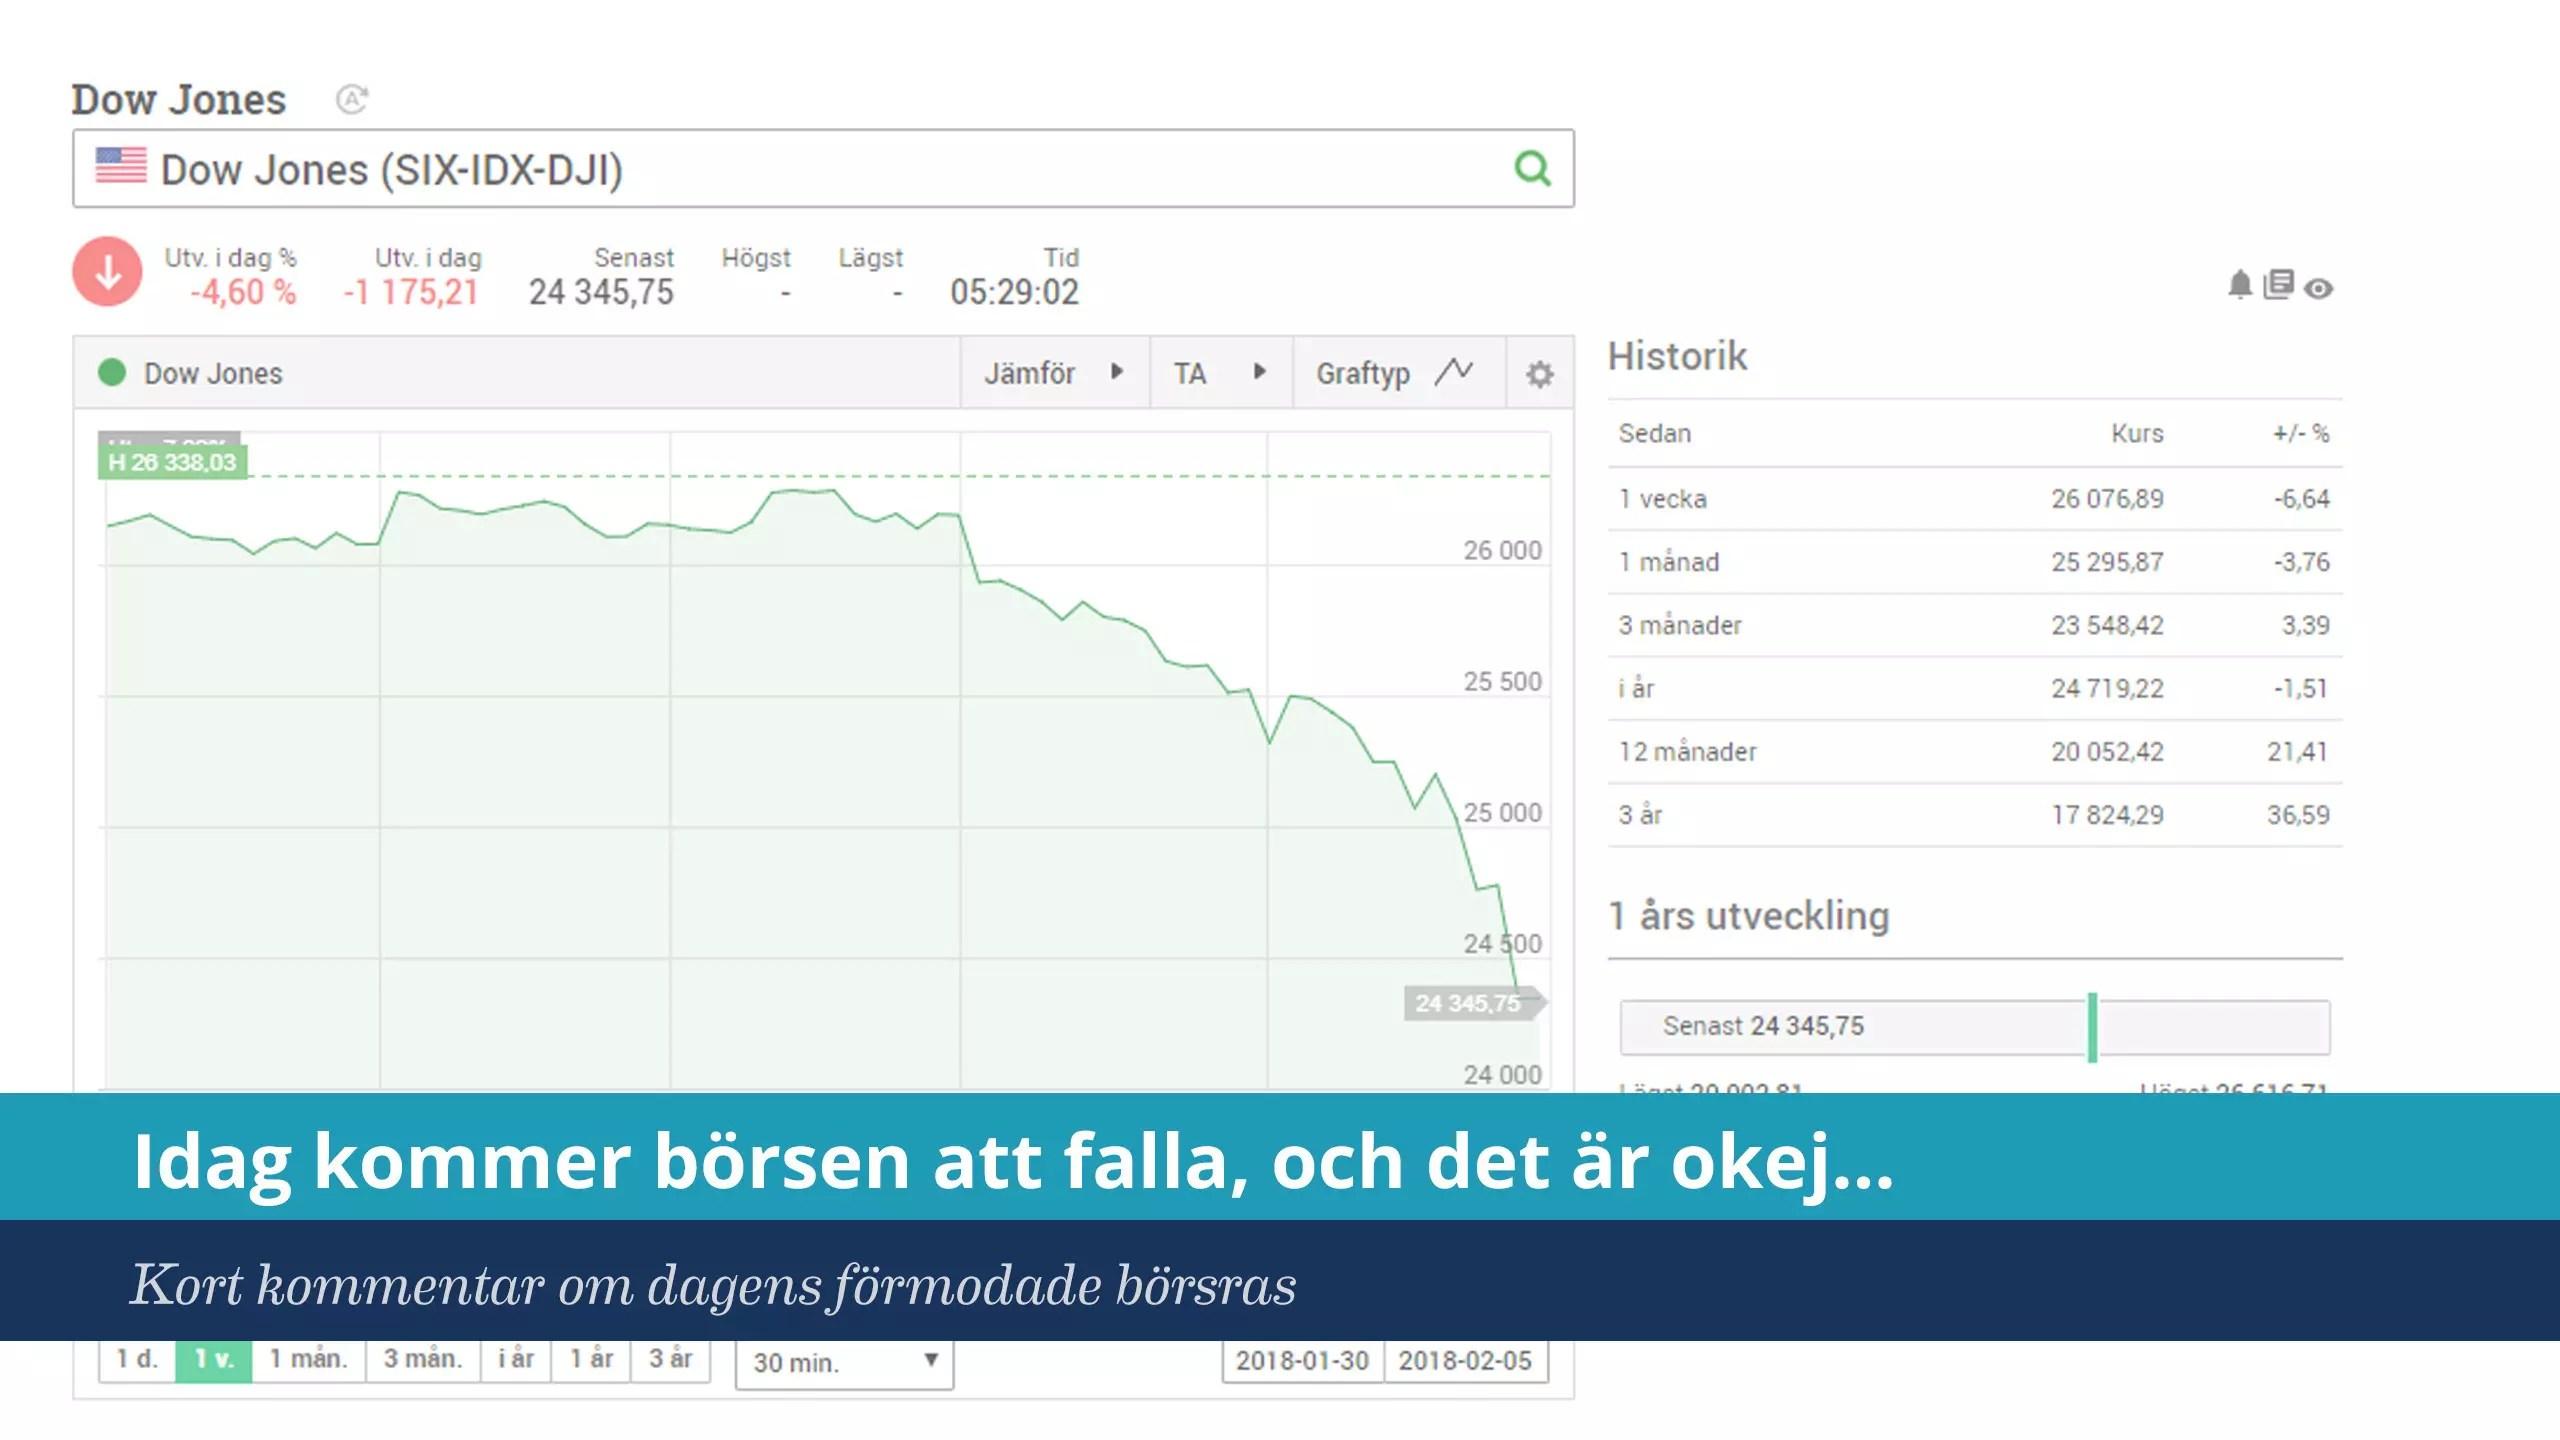 Stockholmsborsen i gar nedat for nastan alla aktier